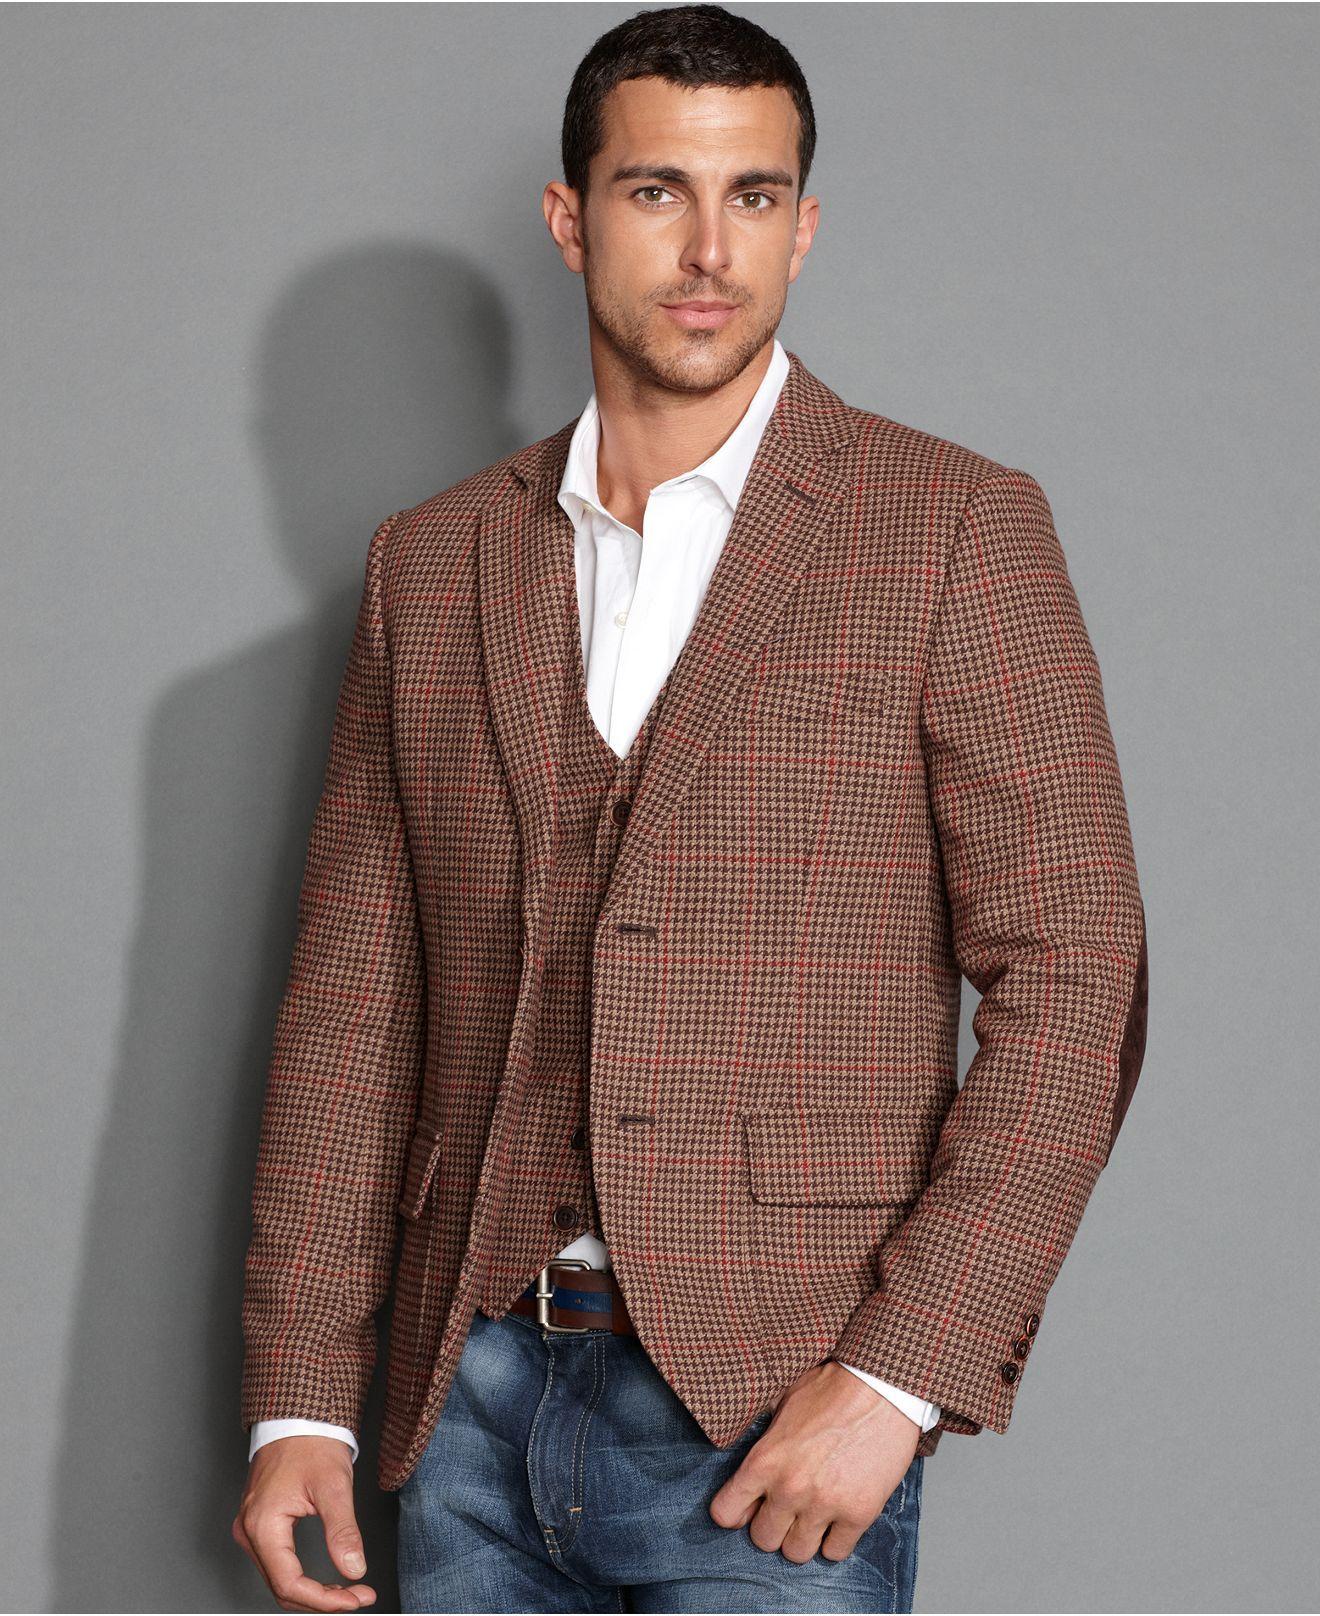 Tommy Hilfiger Jacket, Huntley Wool Blazer - Blazers & Sport Coats ...